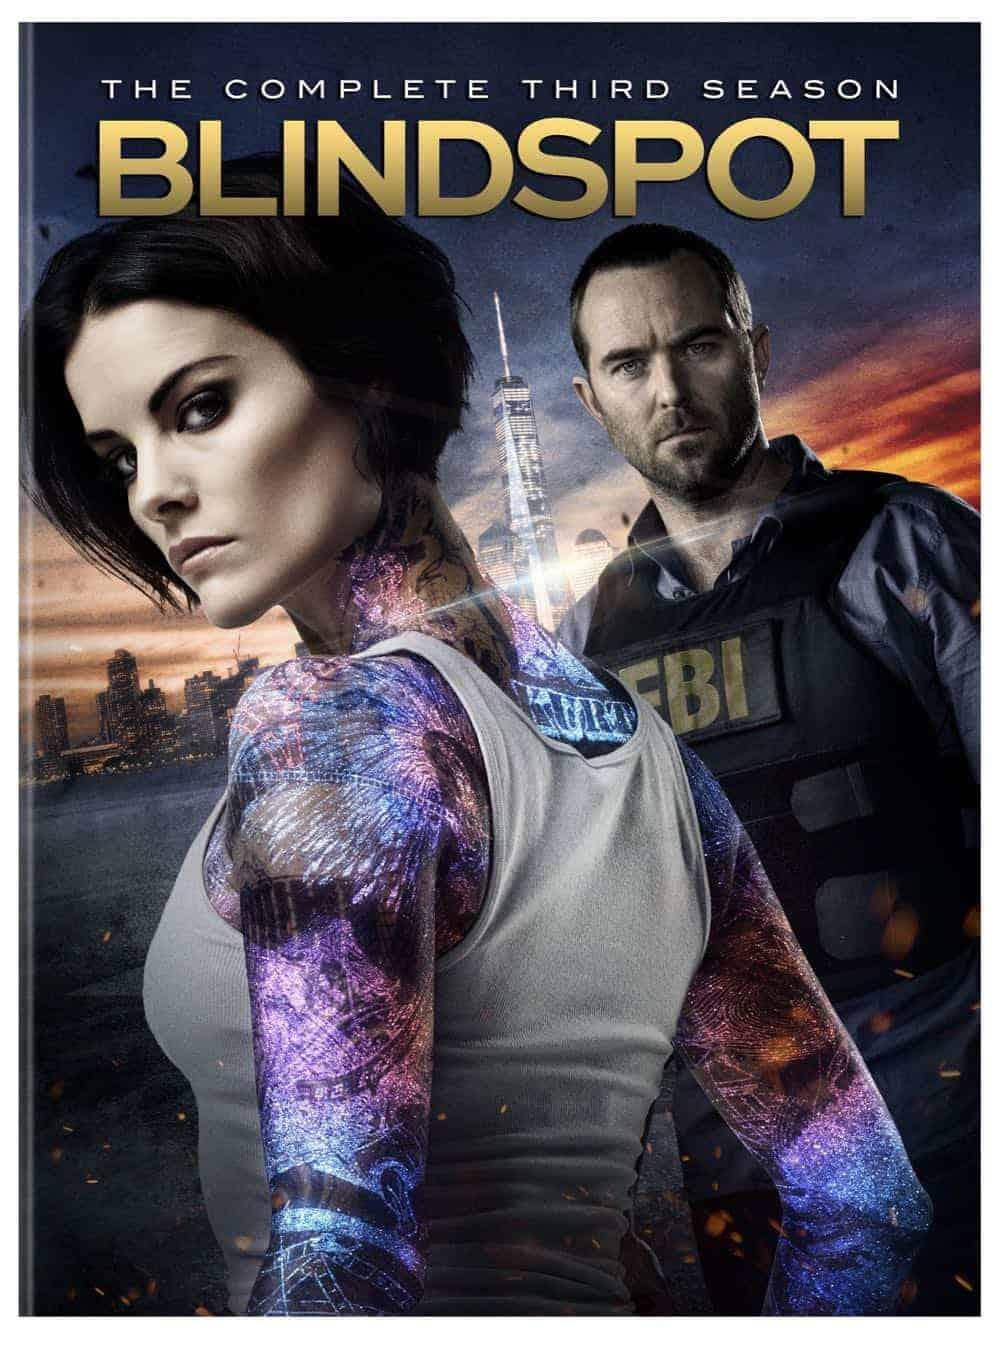 Blindspot-Season-3-DVD-Box-Cover-Artwork-1